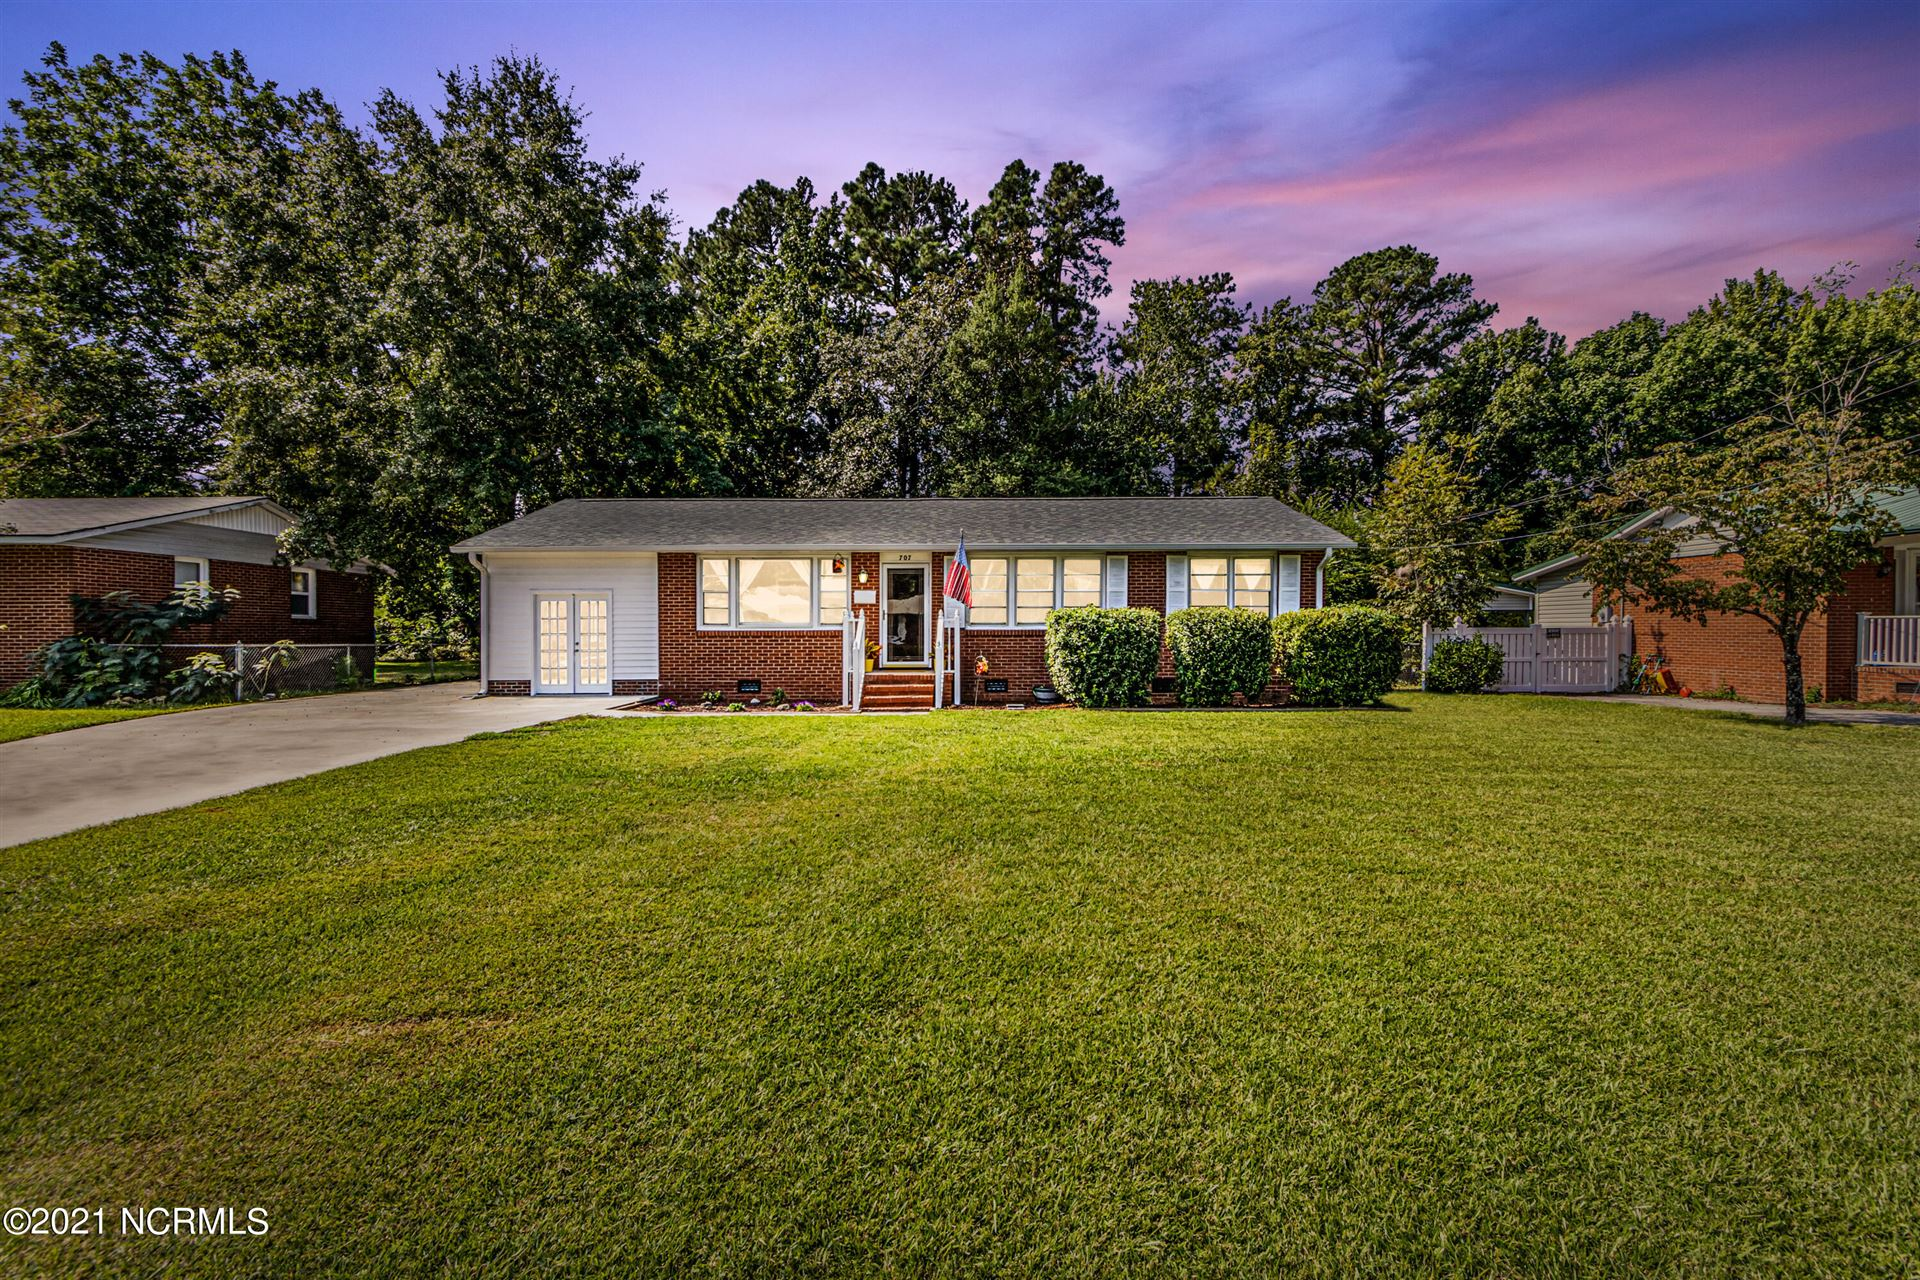 Photo of 707 Waltmore Street, Jacksonville, NC 28540 (MLS # 100293403)